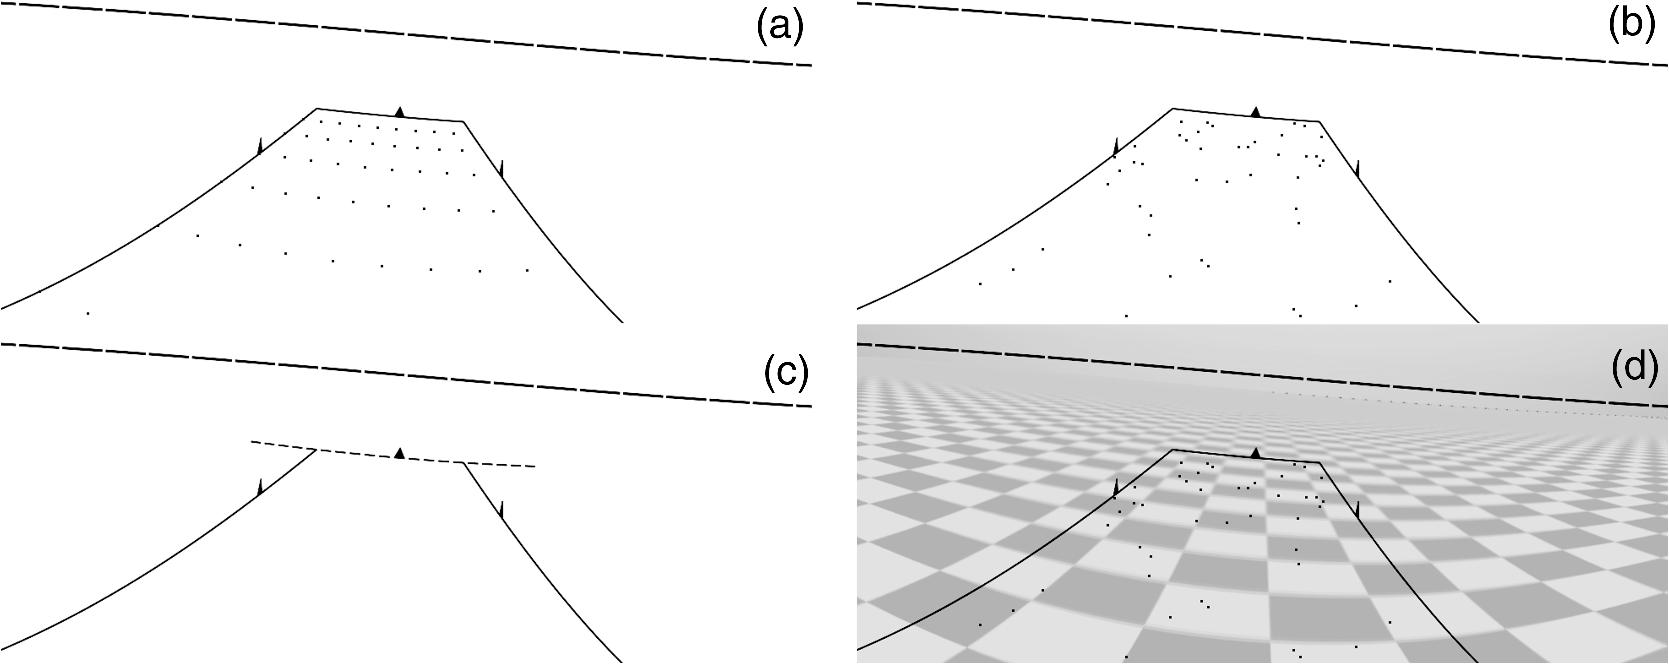 Conformal Displays Human Factor Analysis Of Innovative Landing Aids Wiring Diagram 3 5 Mm Headphone Jack Gecko G540 Fig 10